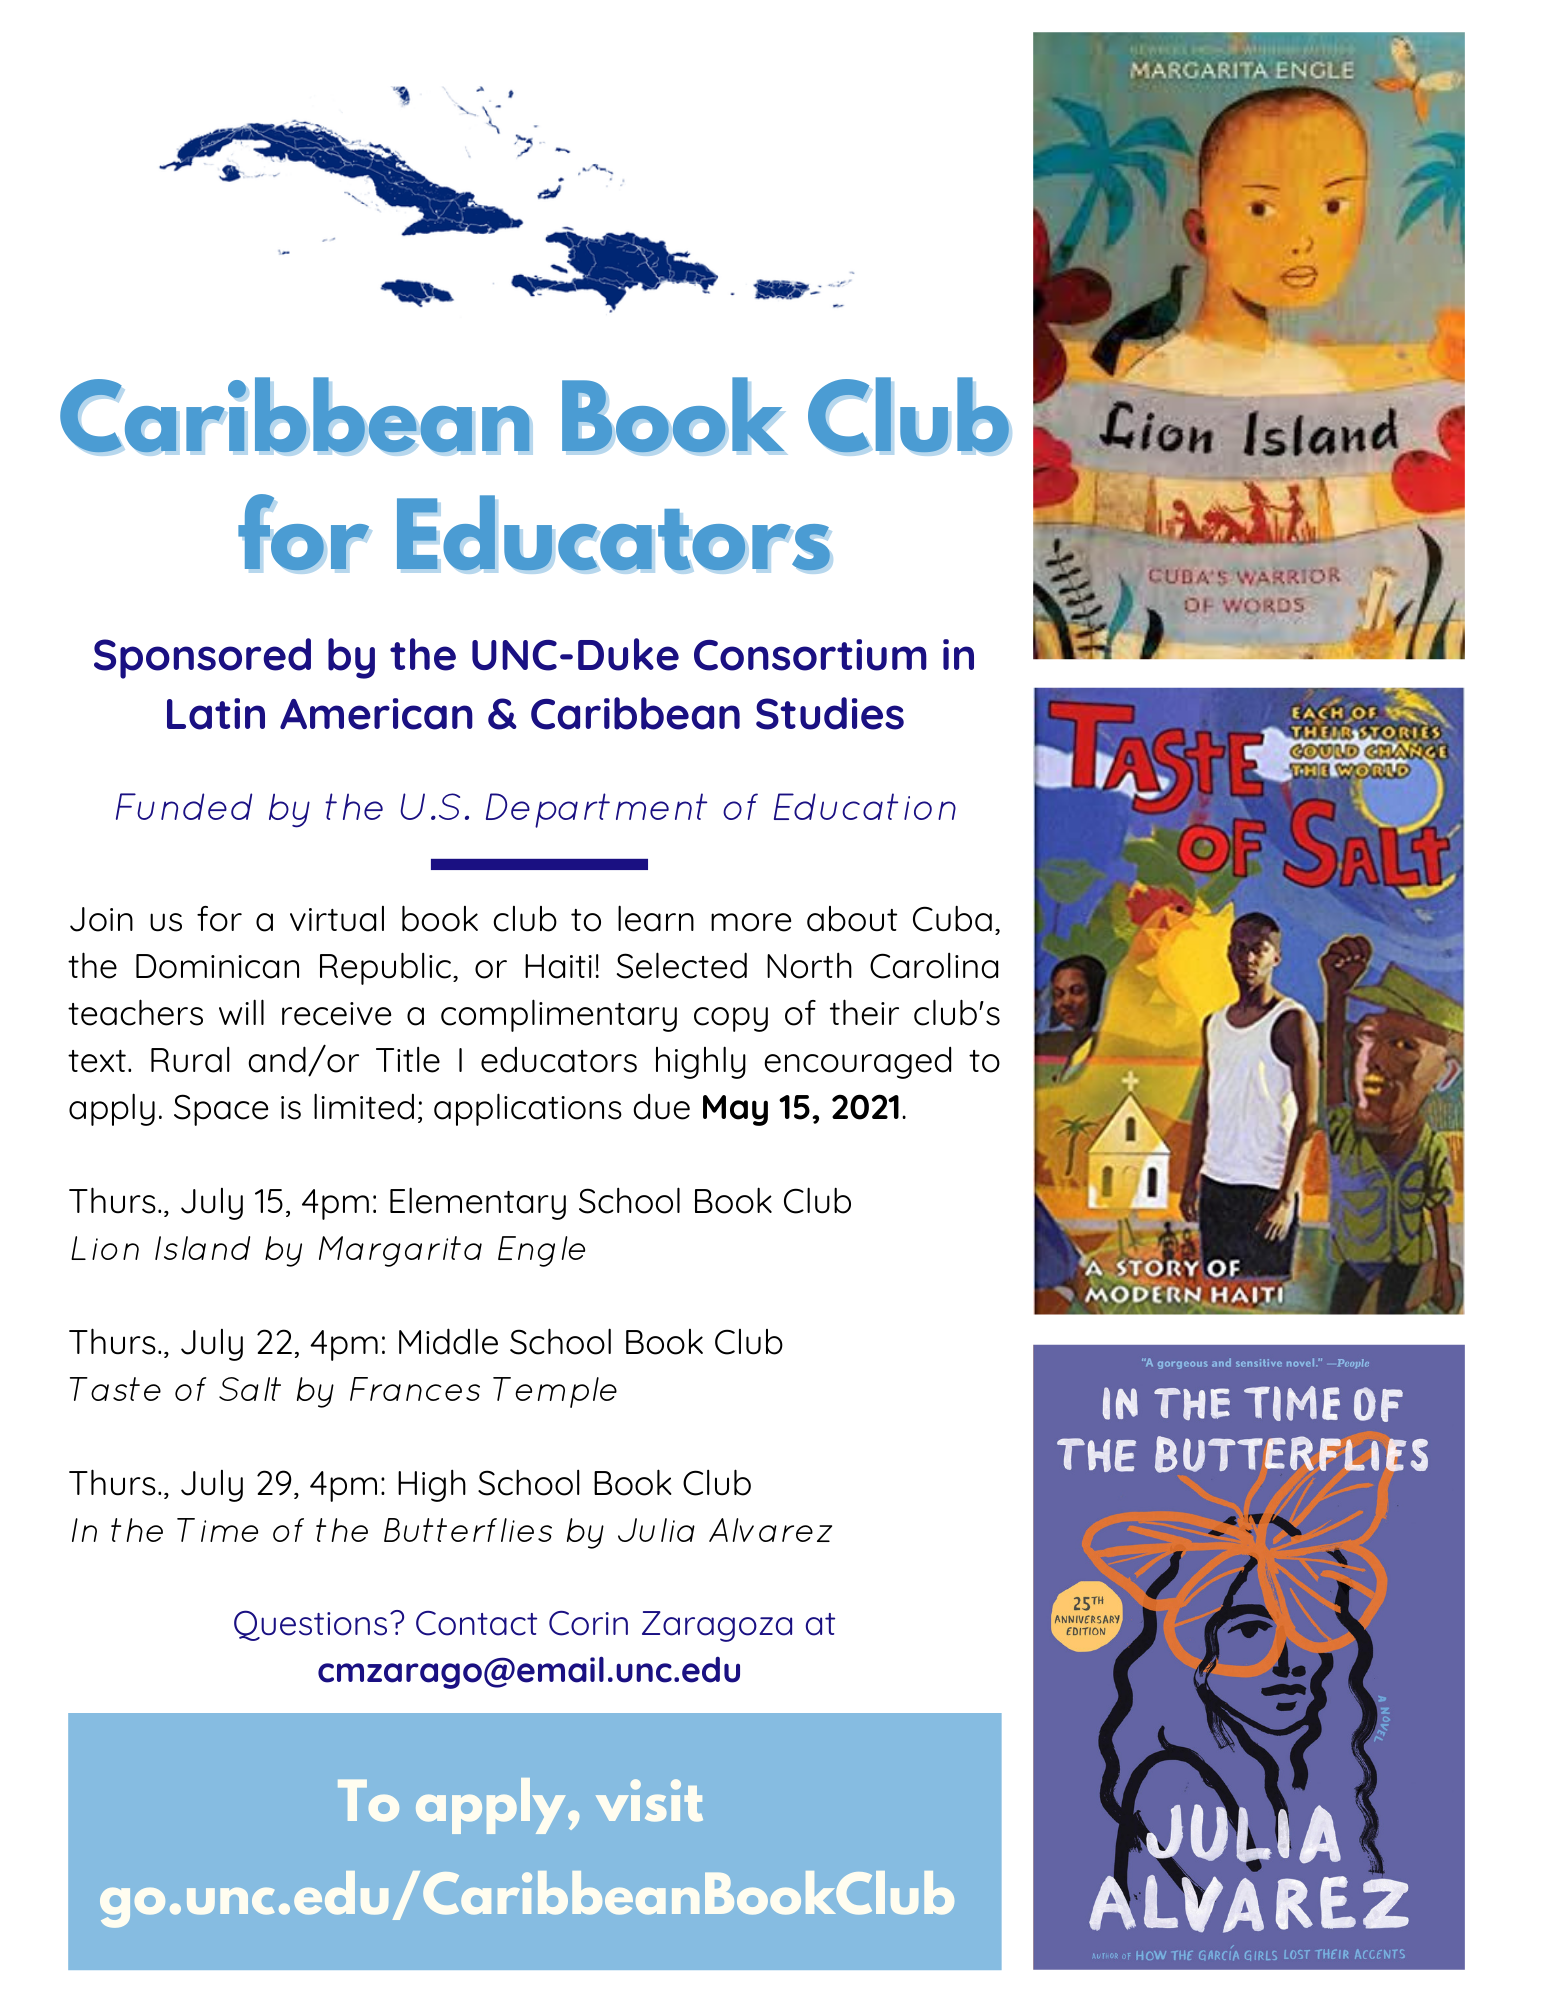 Caribbean Book Club for Educators - Middle School